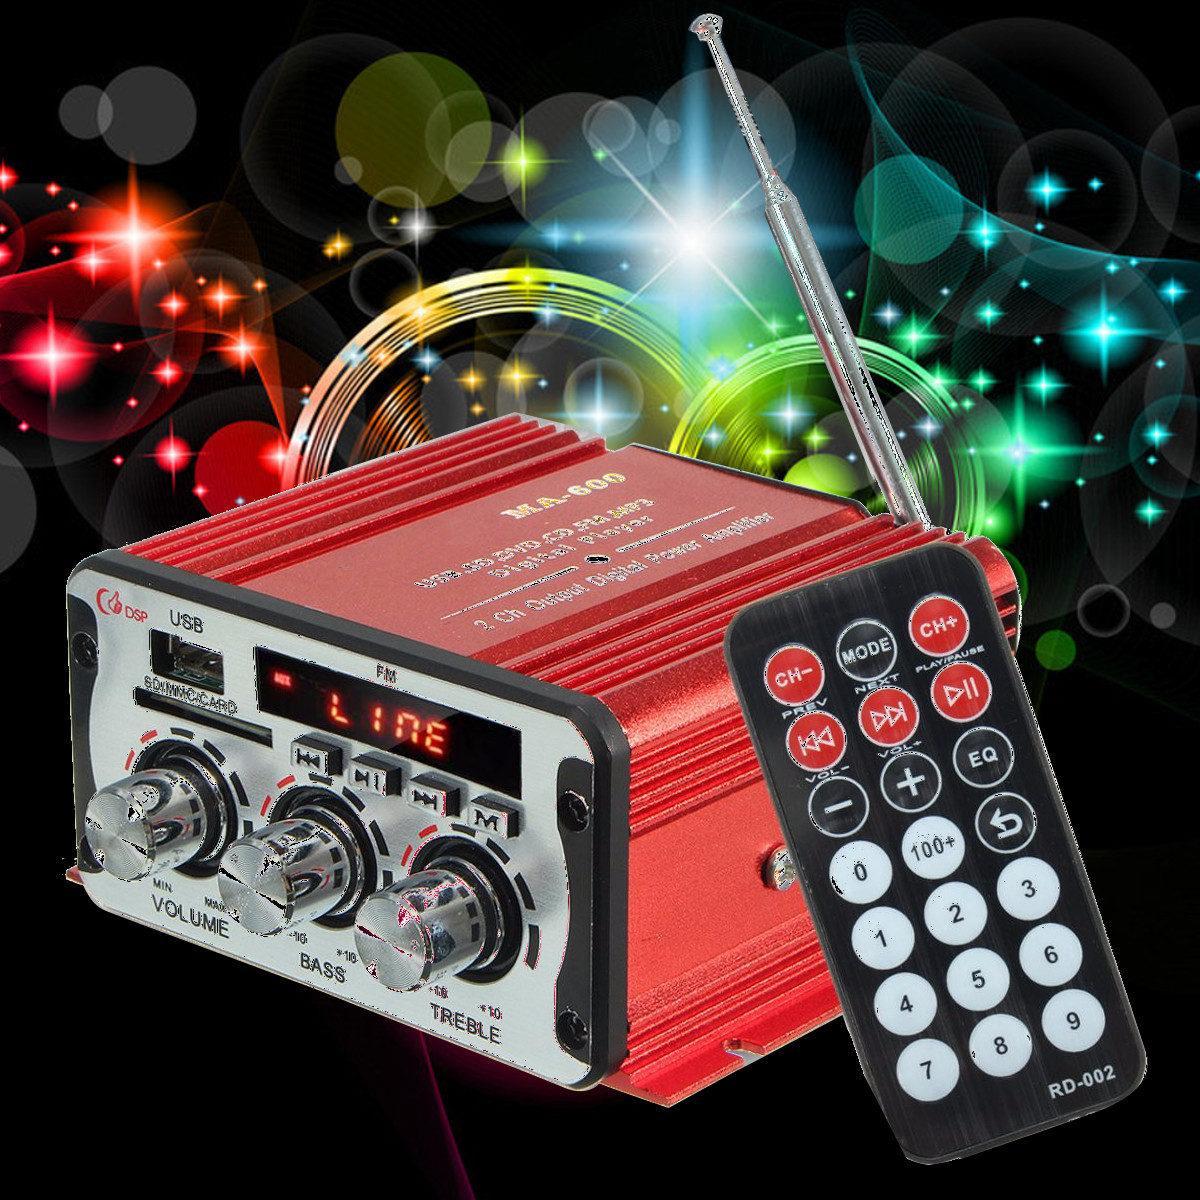 car stereo amplifier dc12v ac220v bluetooth 2ch hi fi car stereo audio power amplifier digital player usb sd fm dvd for car auto 12V Mini Car Amplifier Motorcycle Home Boat Auto Stereo Audio Amplifier 2 Channel Digital Hi-Fi Amp Support CD DVD MP3 Speaker